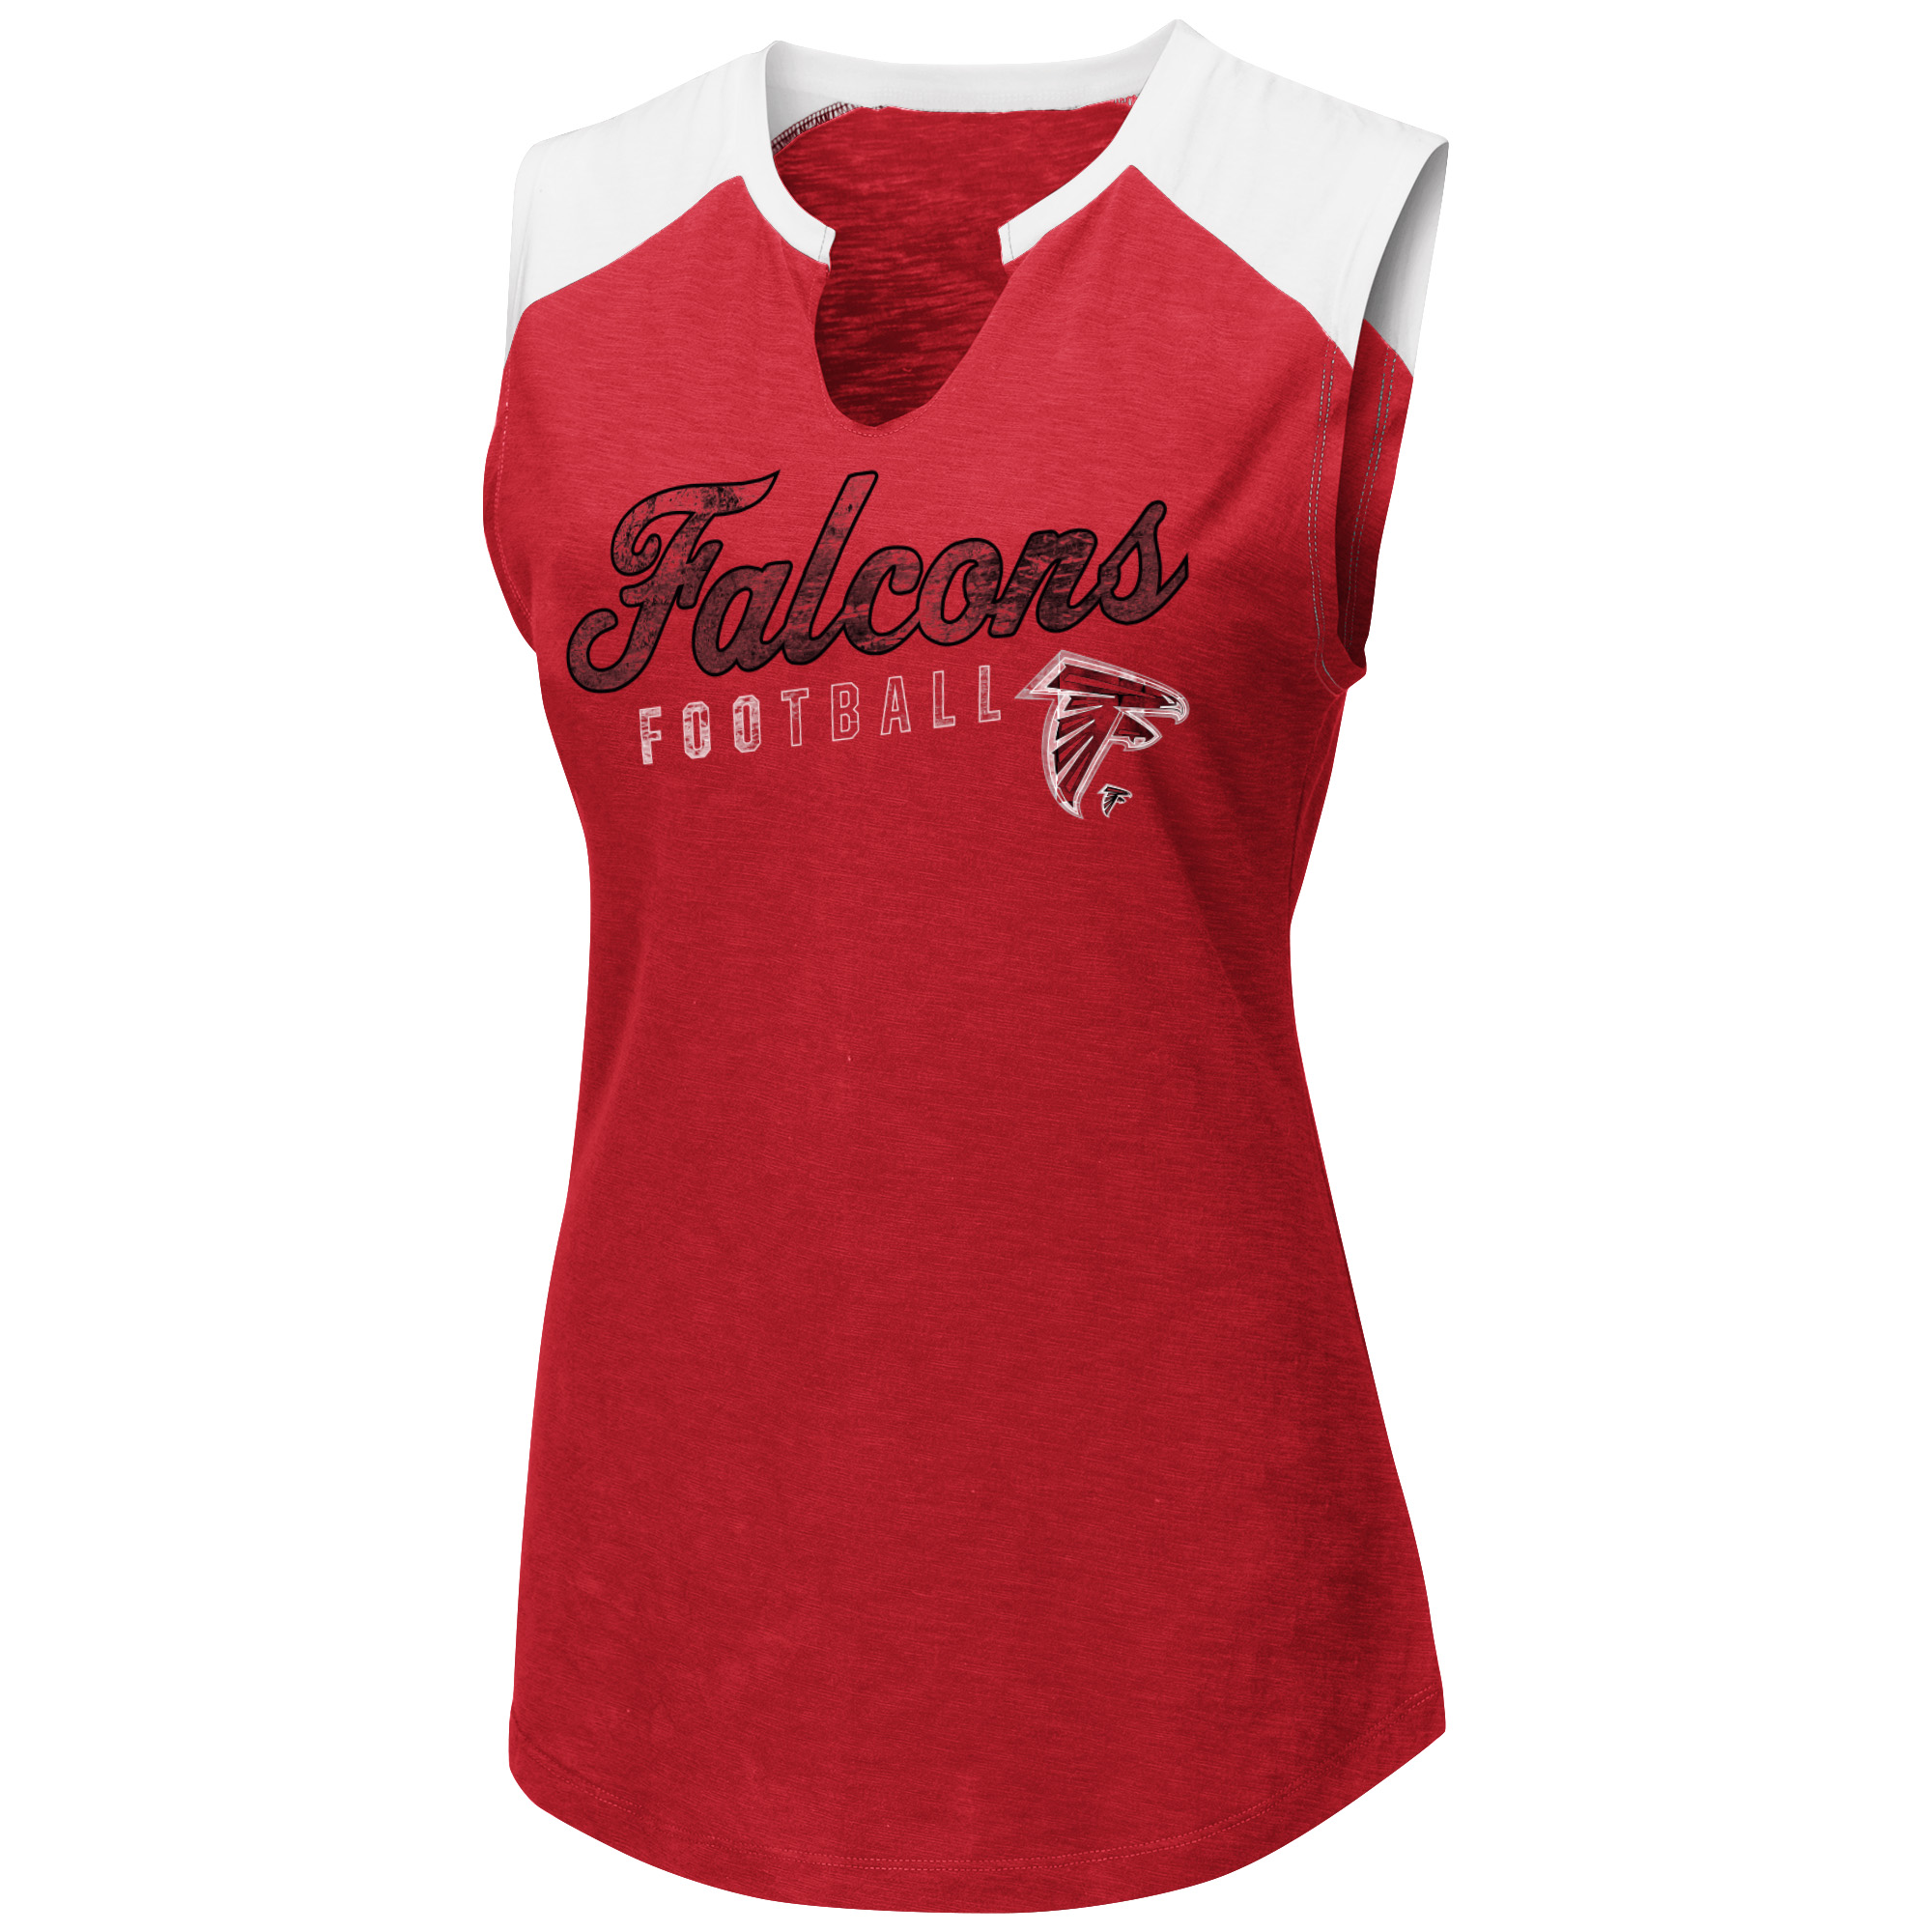 Women's Majestic Red/White Atlanta Falcons V-Notch Muscle Tank Top